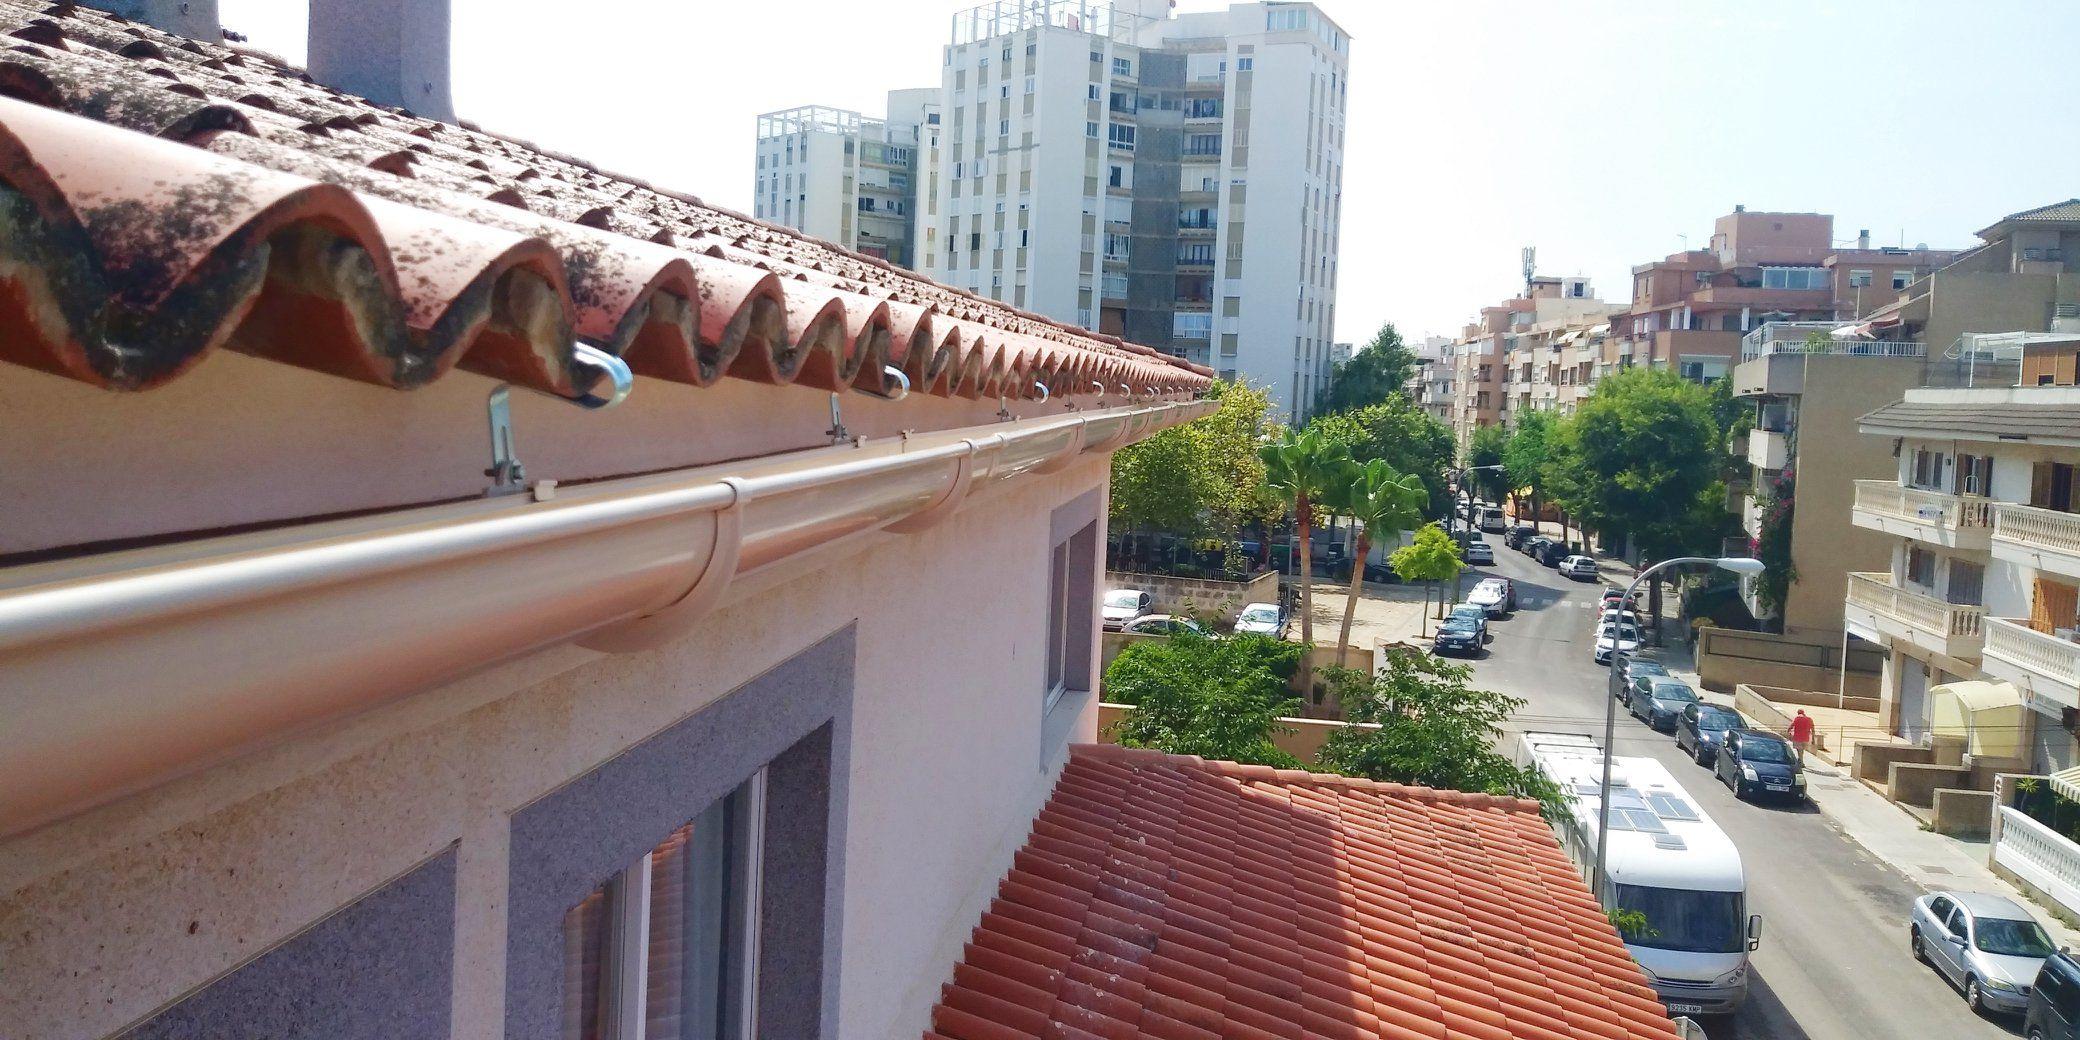 Trabajos de impermeabilización en Mallorca